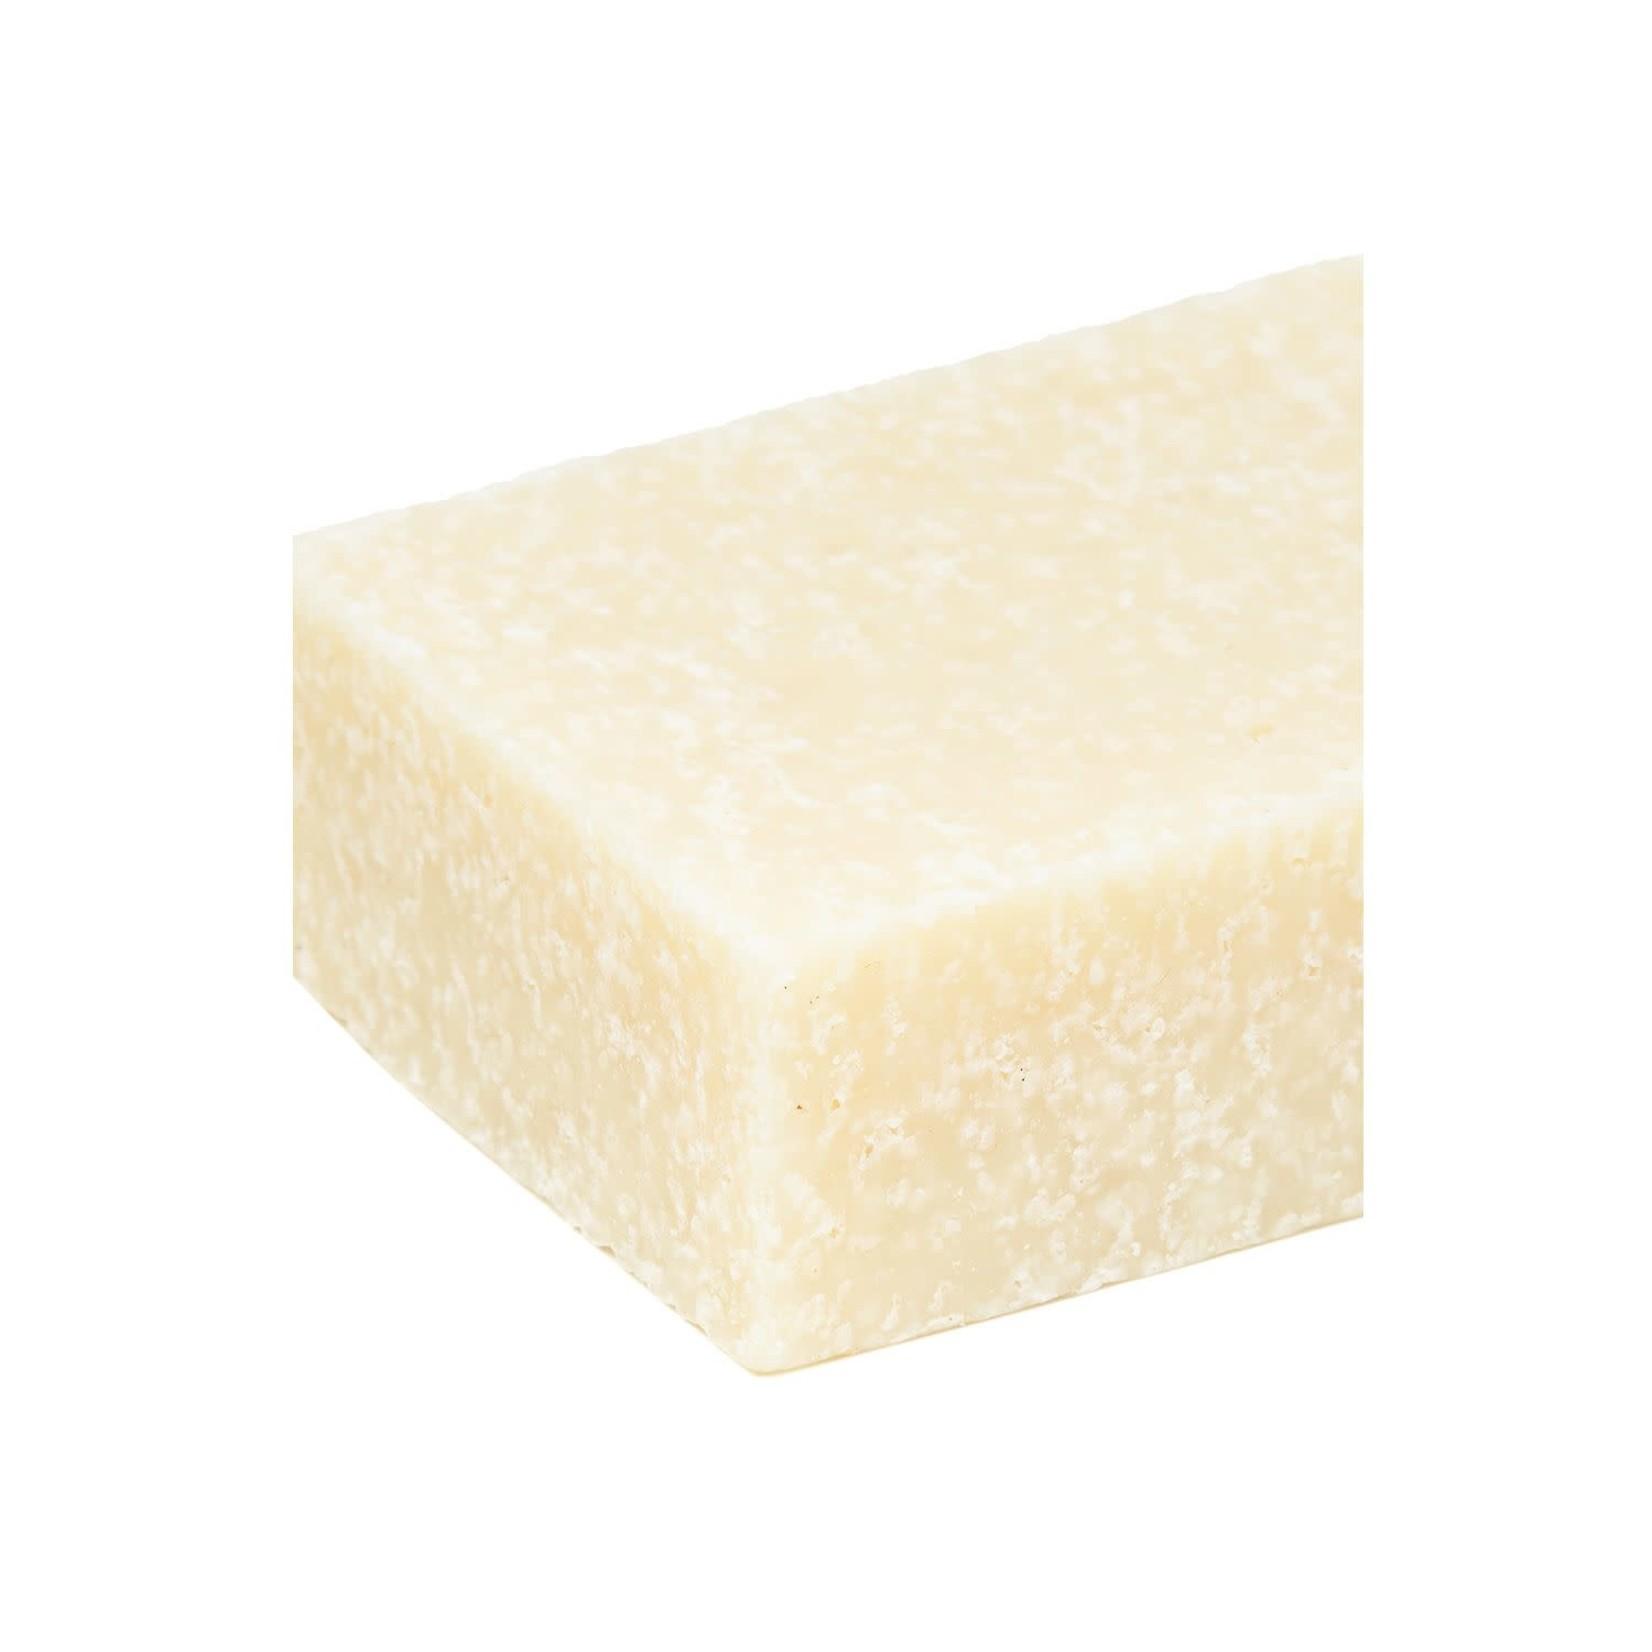 UNWRAPPED LIFE VEGAN SOAP BAR - CALM